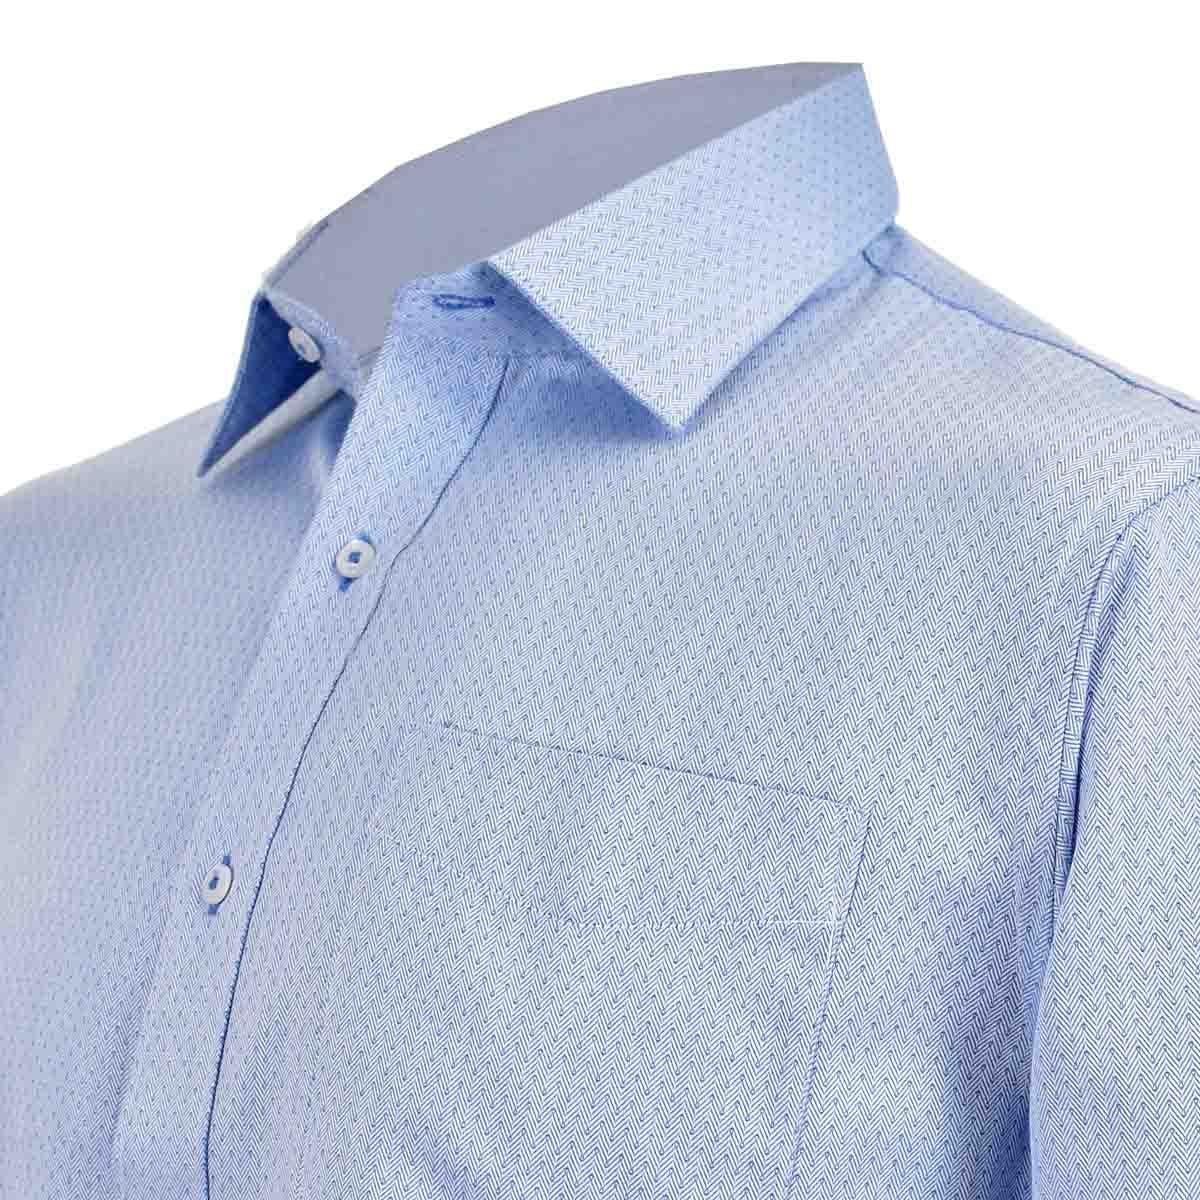 Camisa de Vestir Manga Larga Azul Combinado Nina Ricci